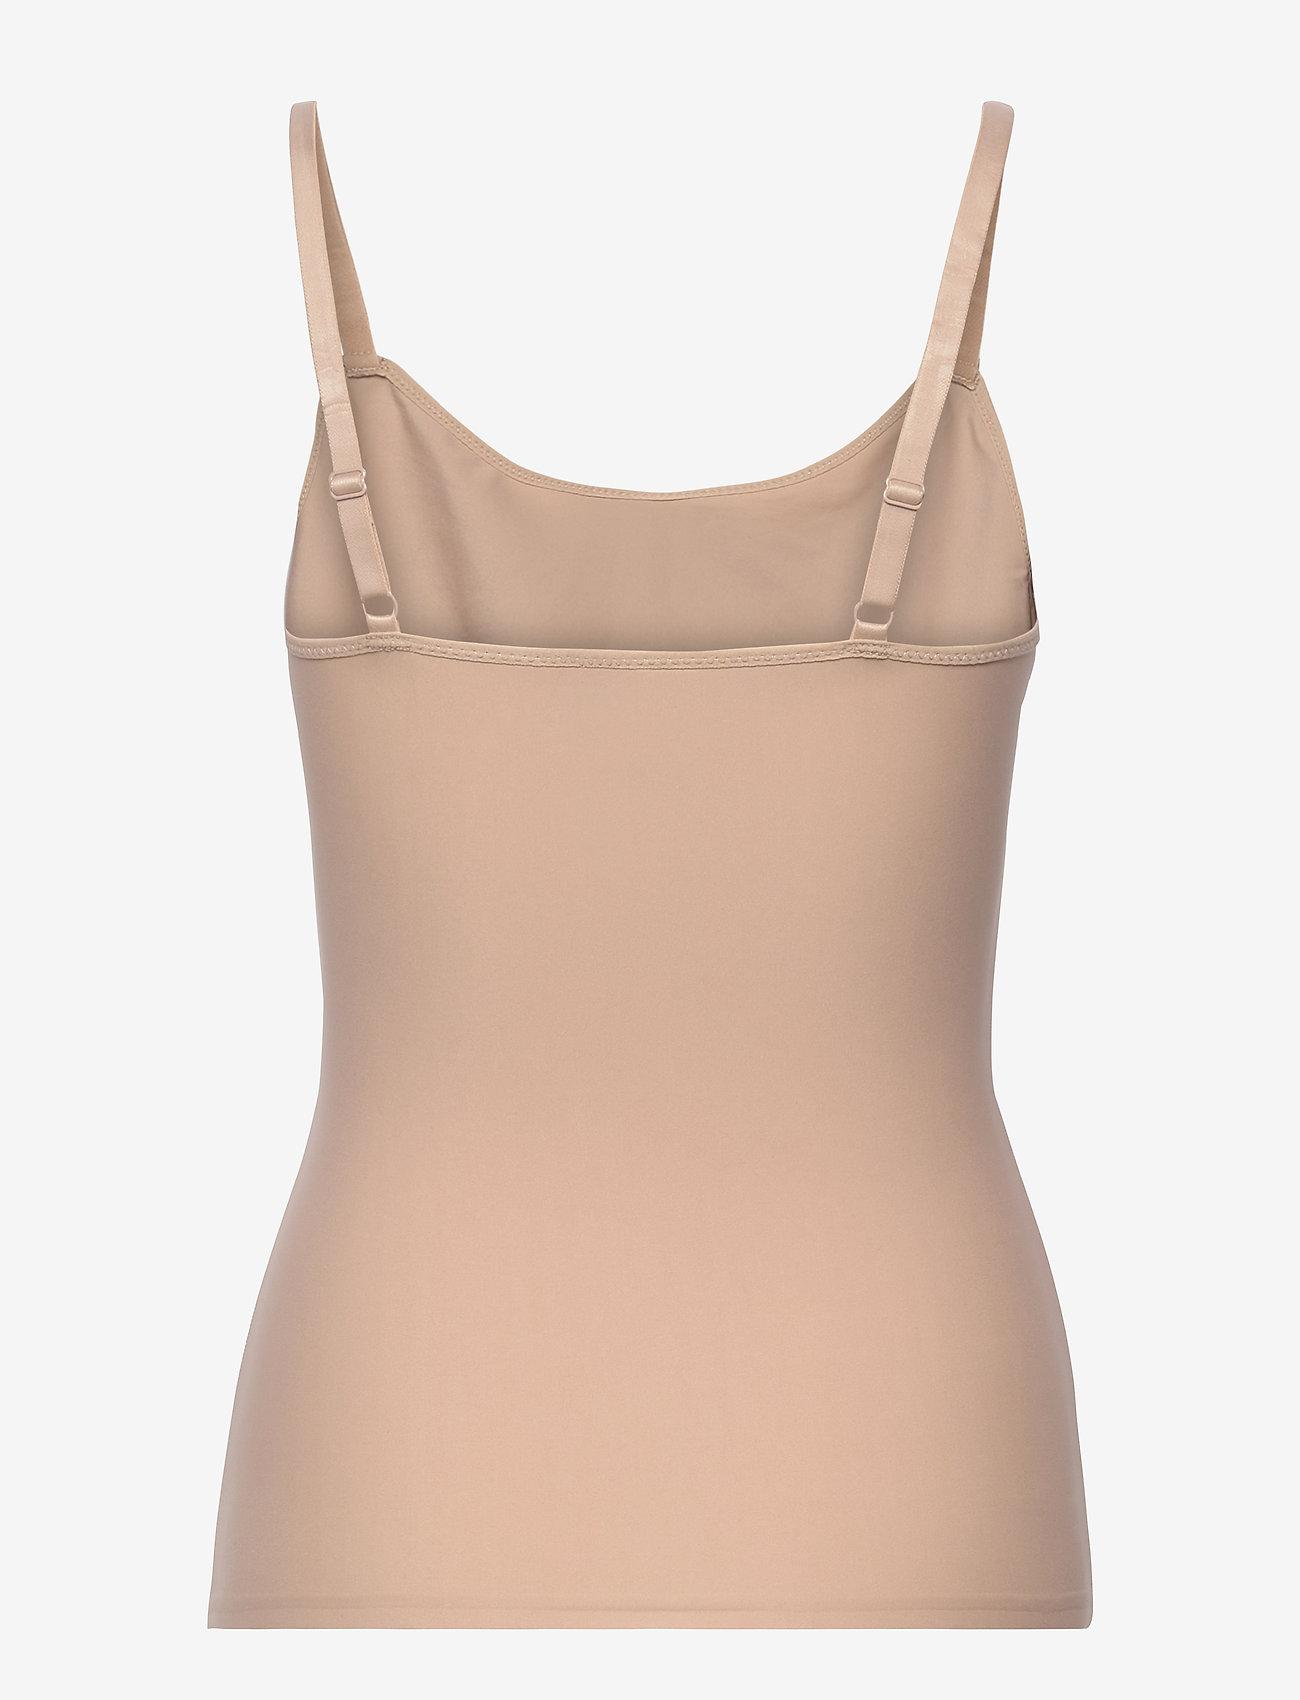 Decoy - DECOY Shapewear top - tops - nude - 1